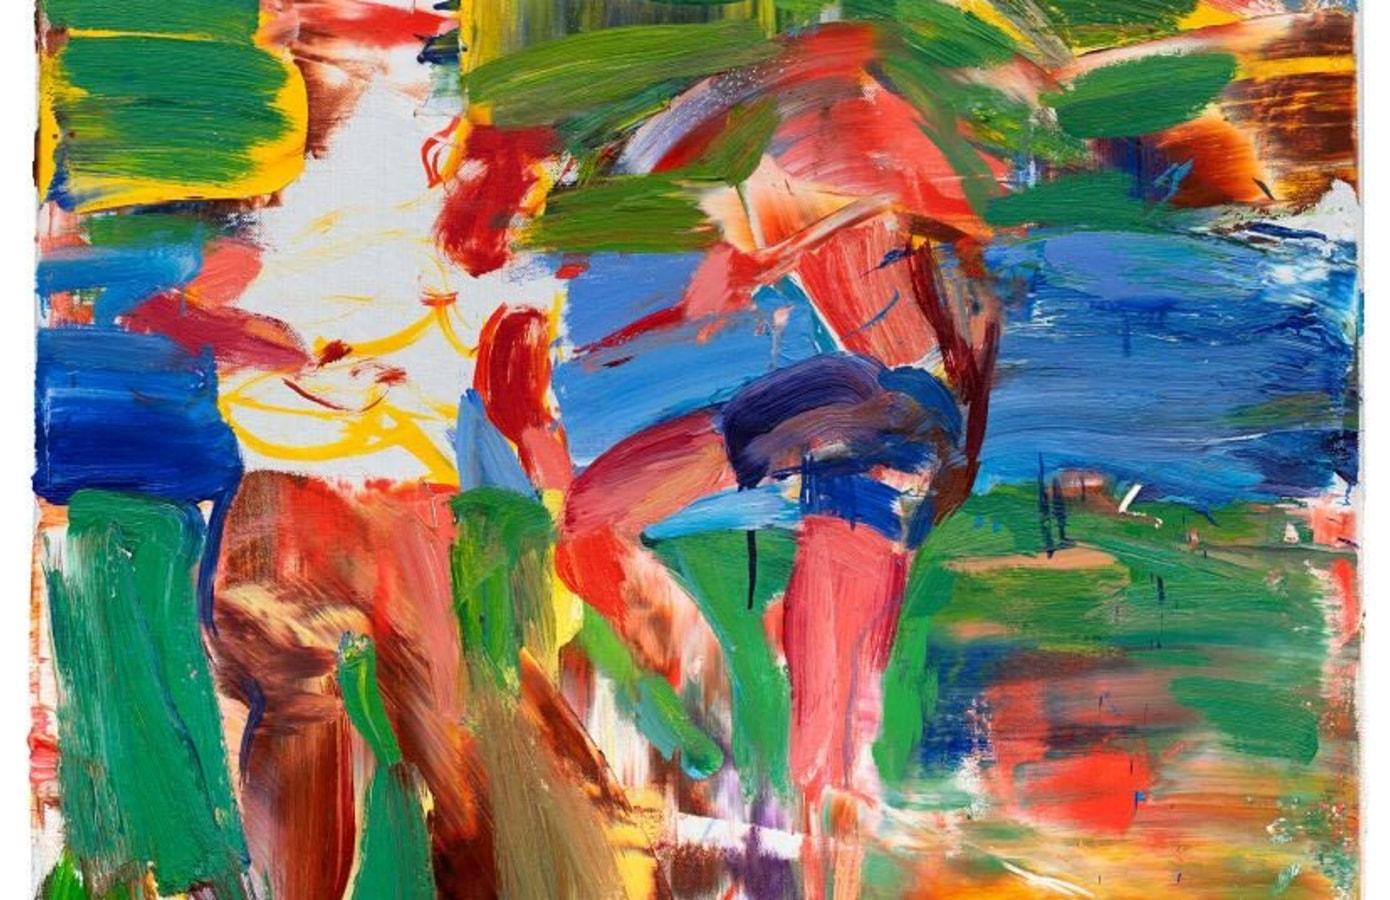 Art Rotterdam 2020, Rao Fu, Dimitar Genchev, Sebastian Hosu, Johan de Wit,